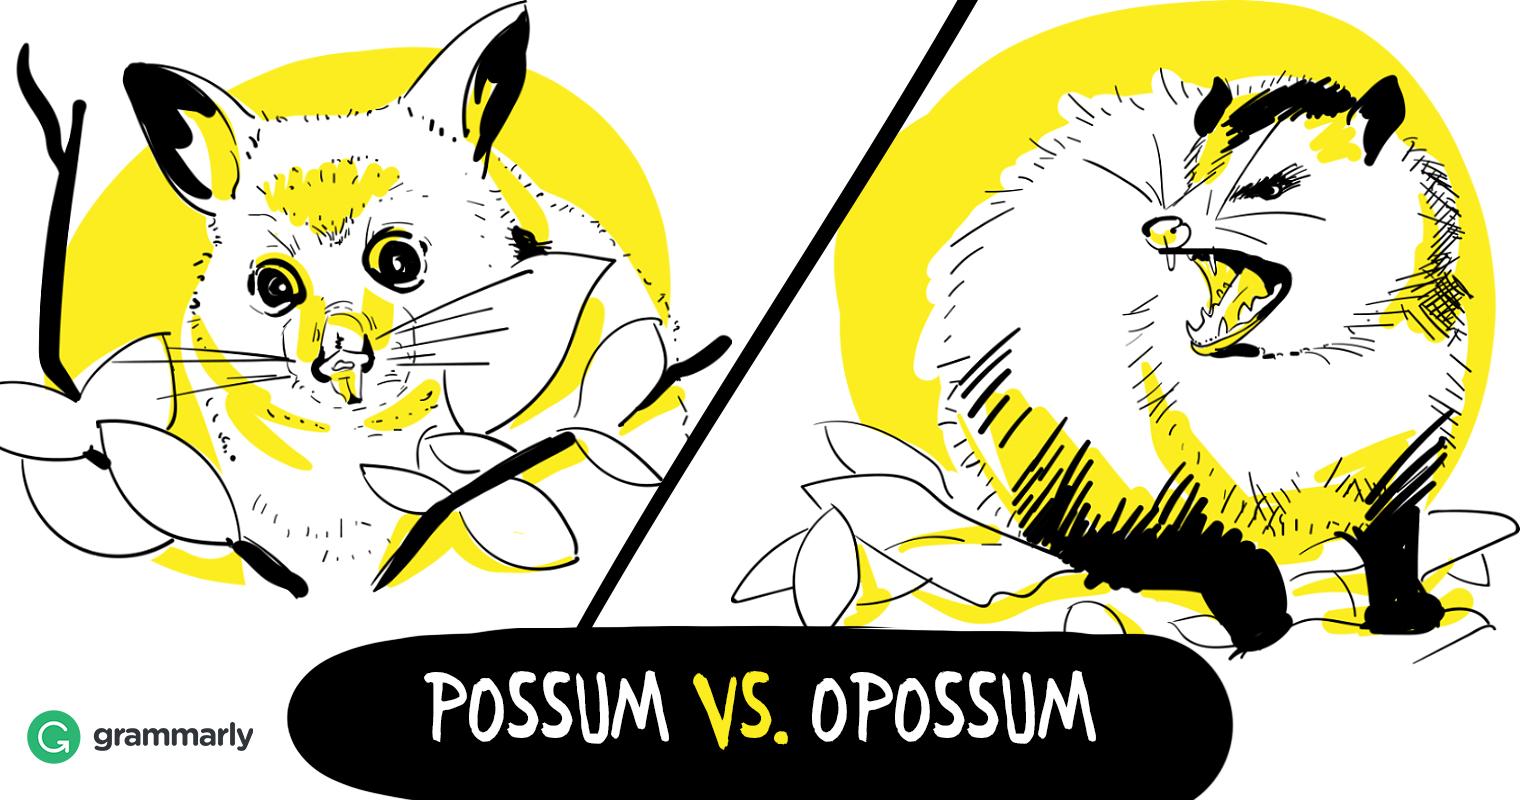 possum cartoon - Google Search   Cartoon styles, Clip art, Possum